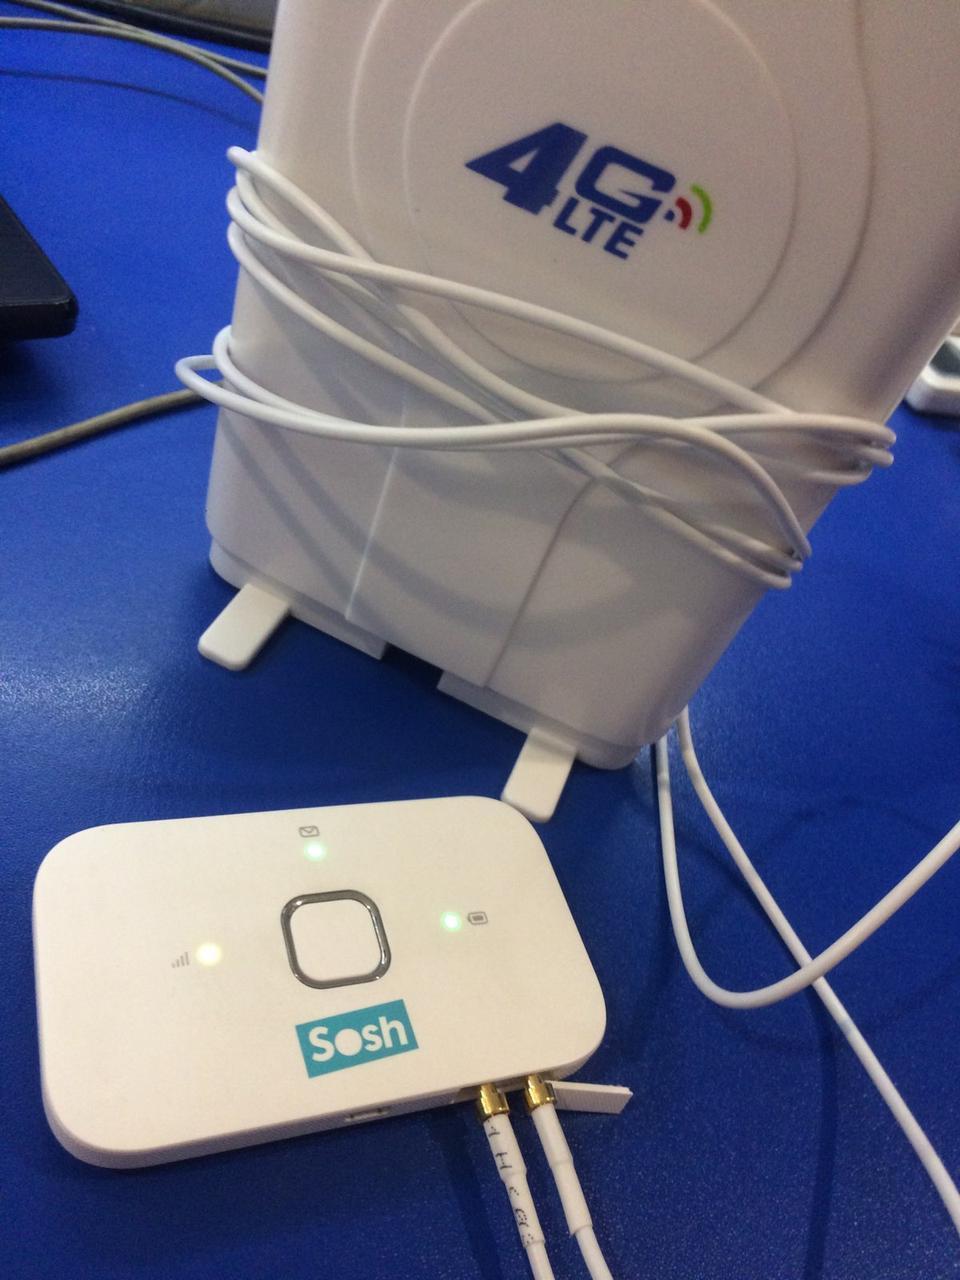 3G/4G КОМПЛЕКТ HUAWEI R216 (E5573BS-320), АНТЕННА 4G LTE MIMO  (КИЕВСТАР, VODAFONE, LIFECELL)